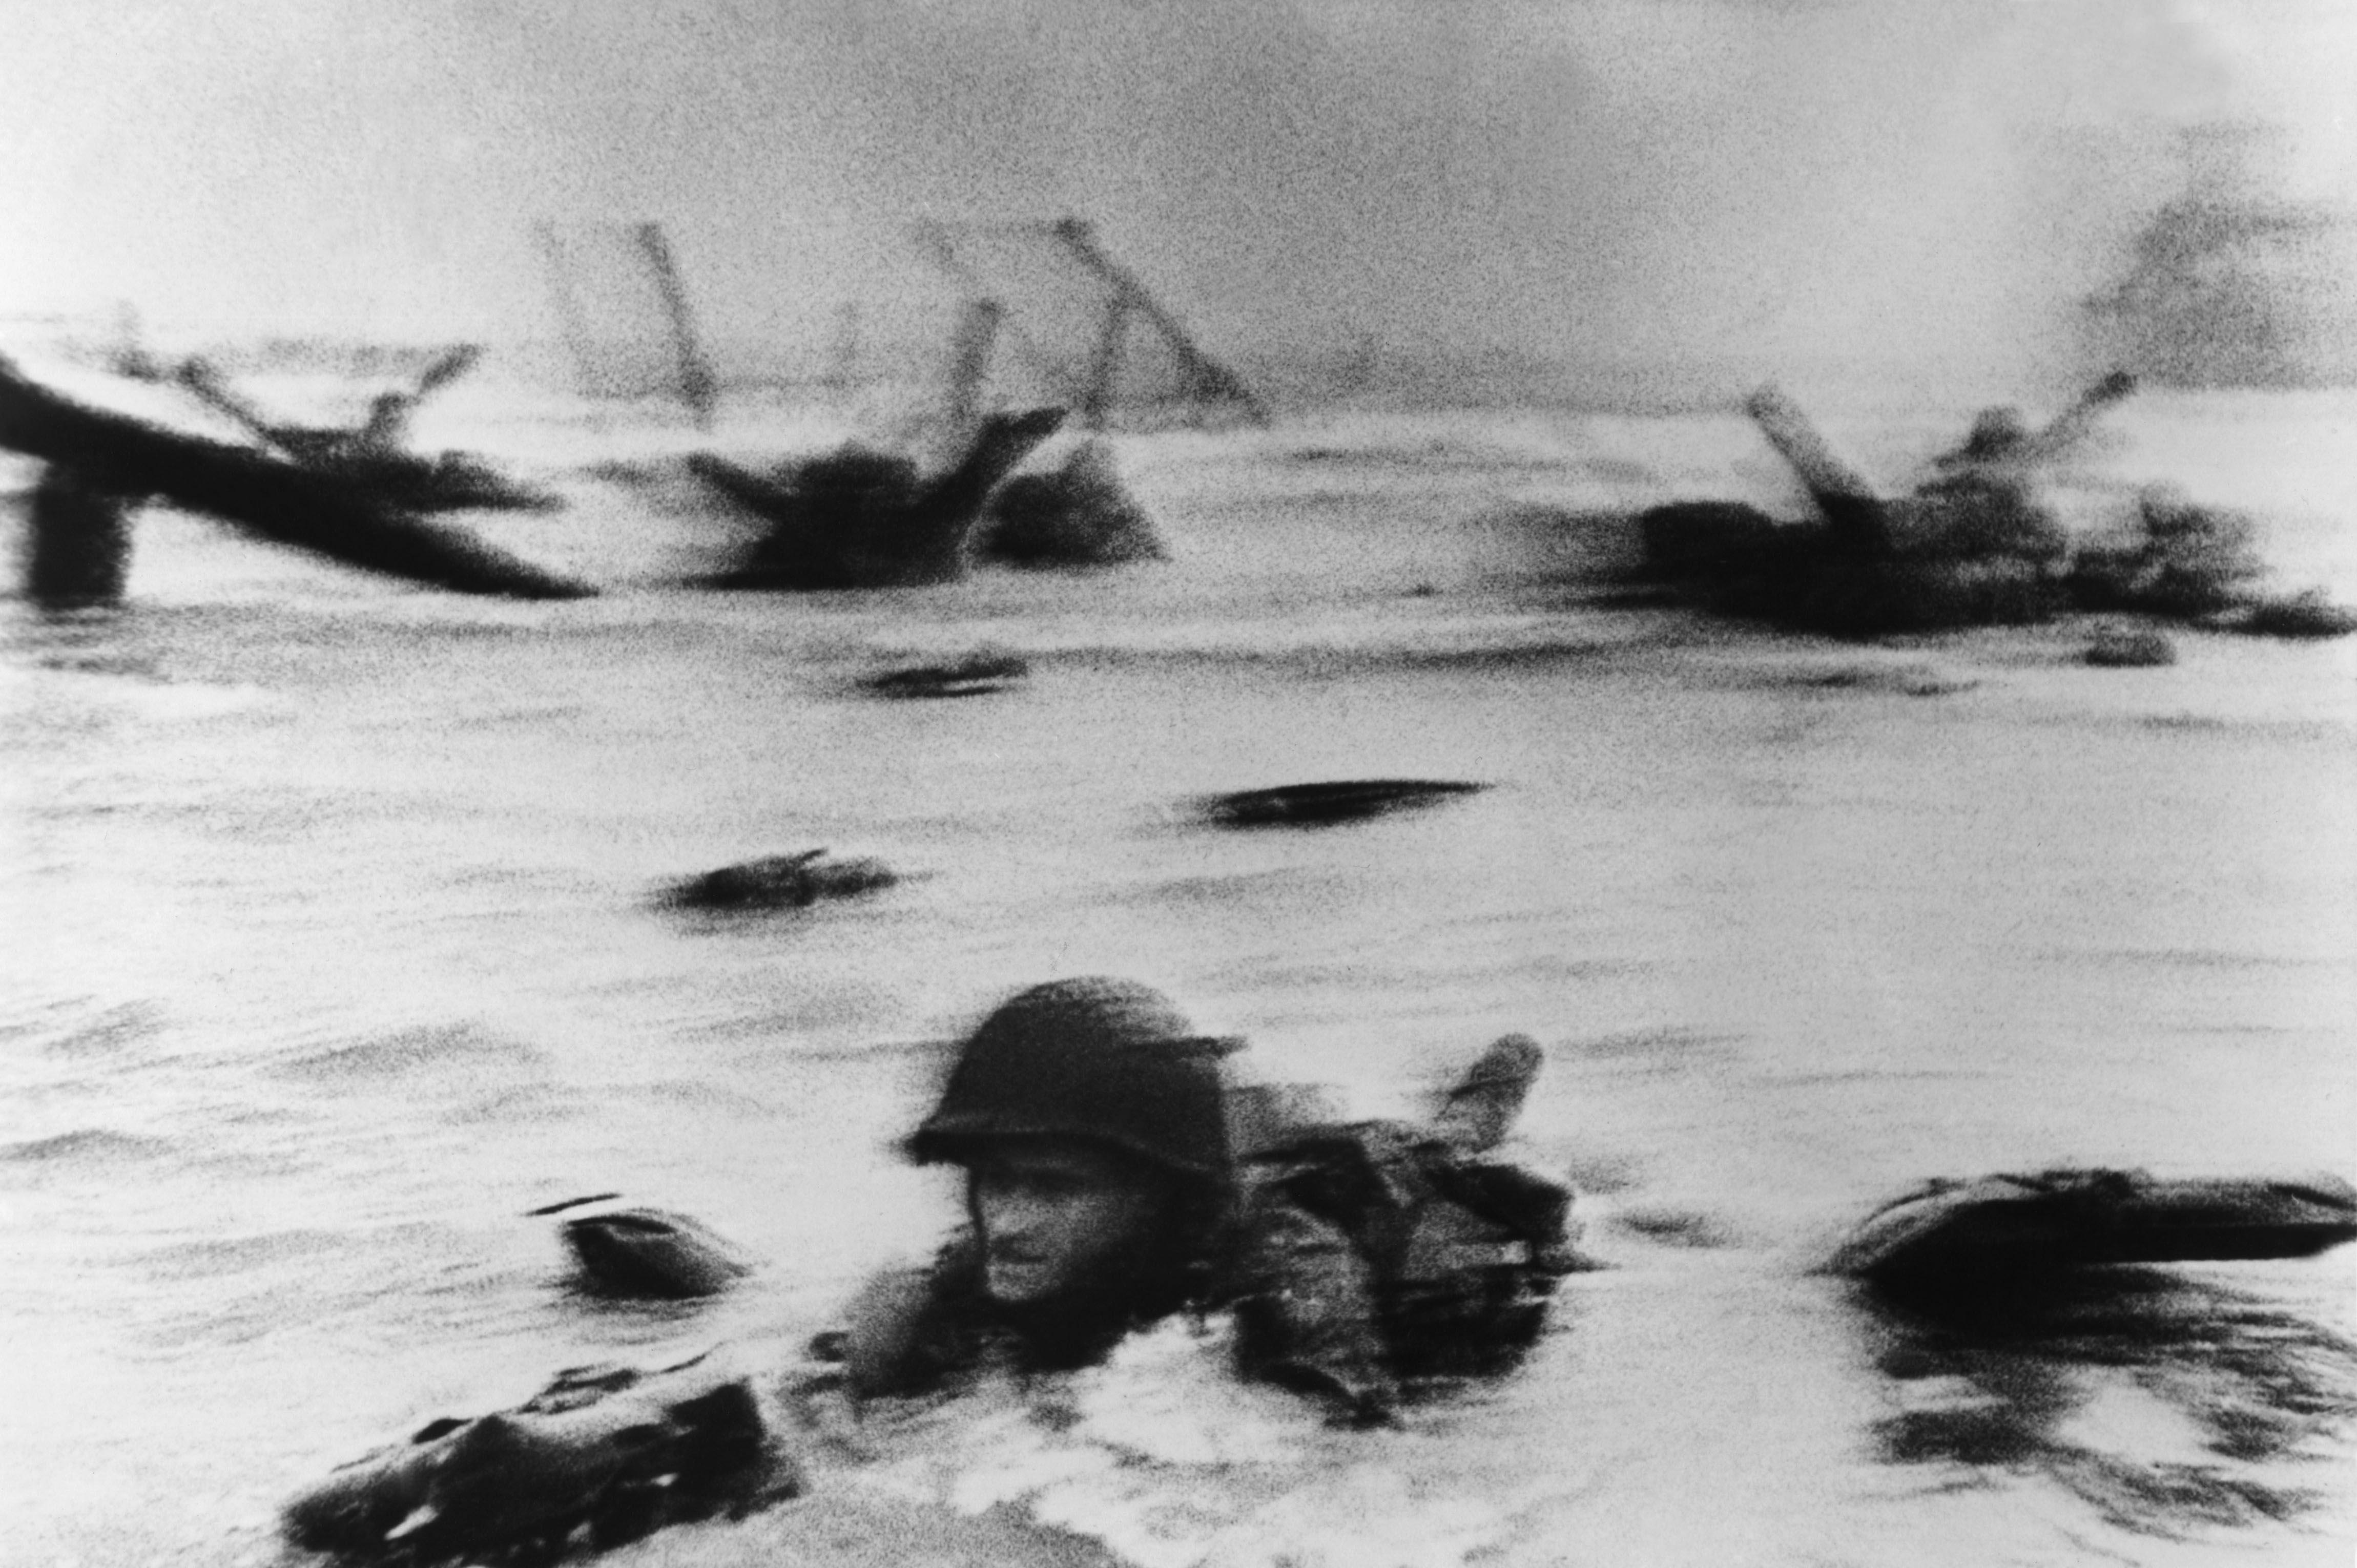 Landing of the American troops on Omaha Beach, Normandy, June 6th 1944 © Robert Capa / Magnum Photos